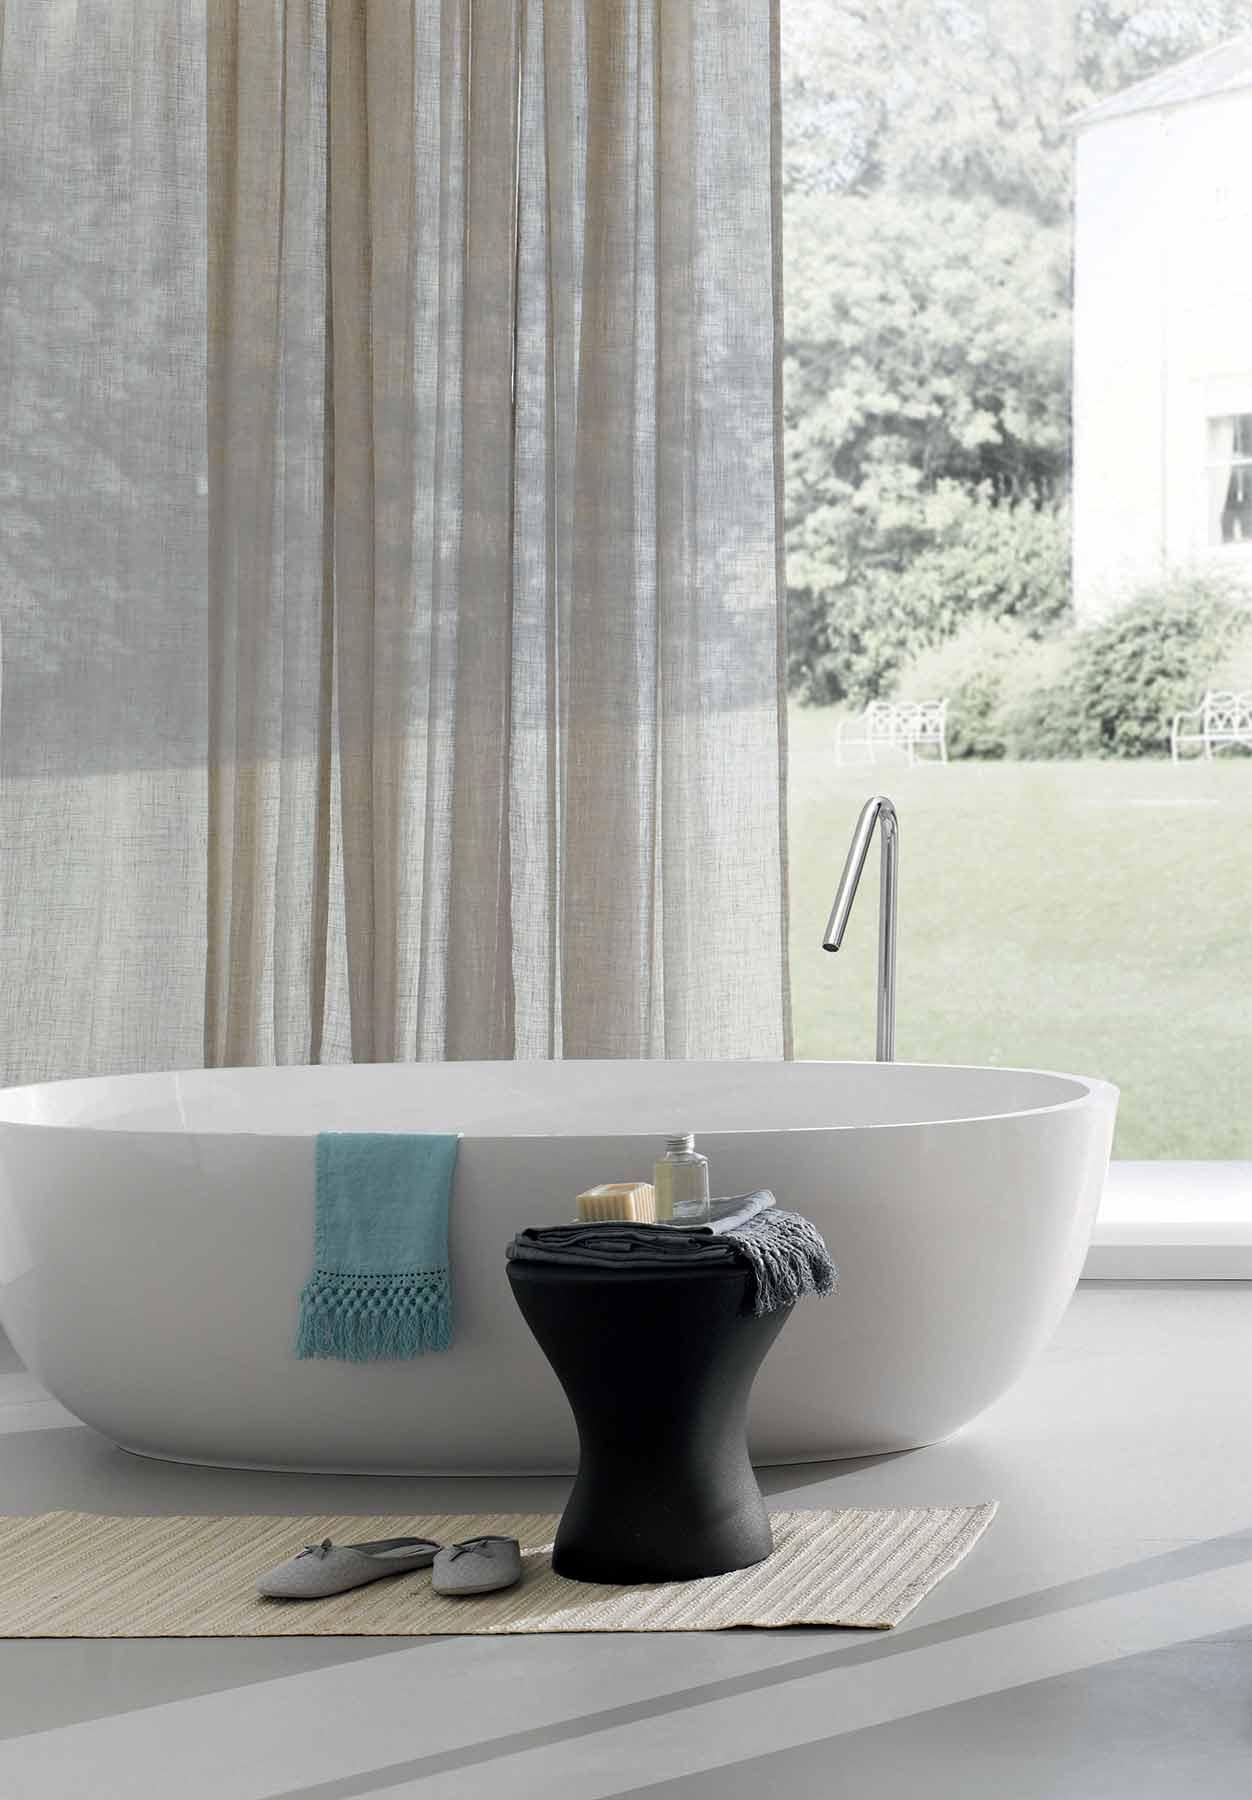 Modern Azure Freestanding Oval Bathtub